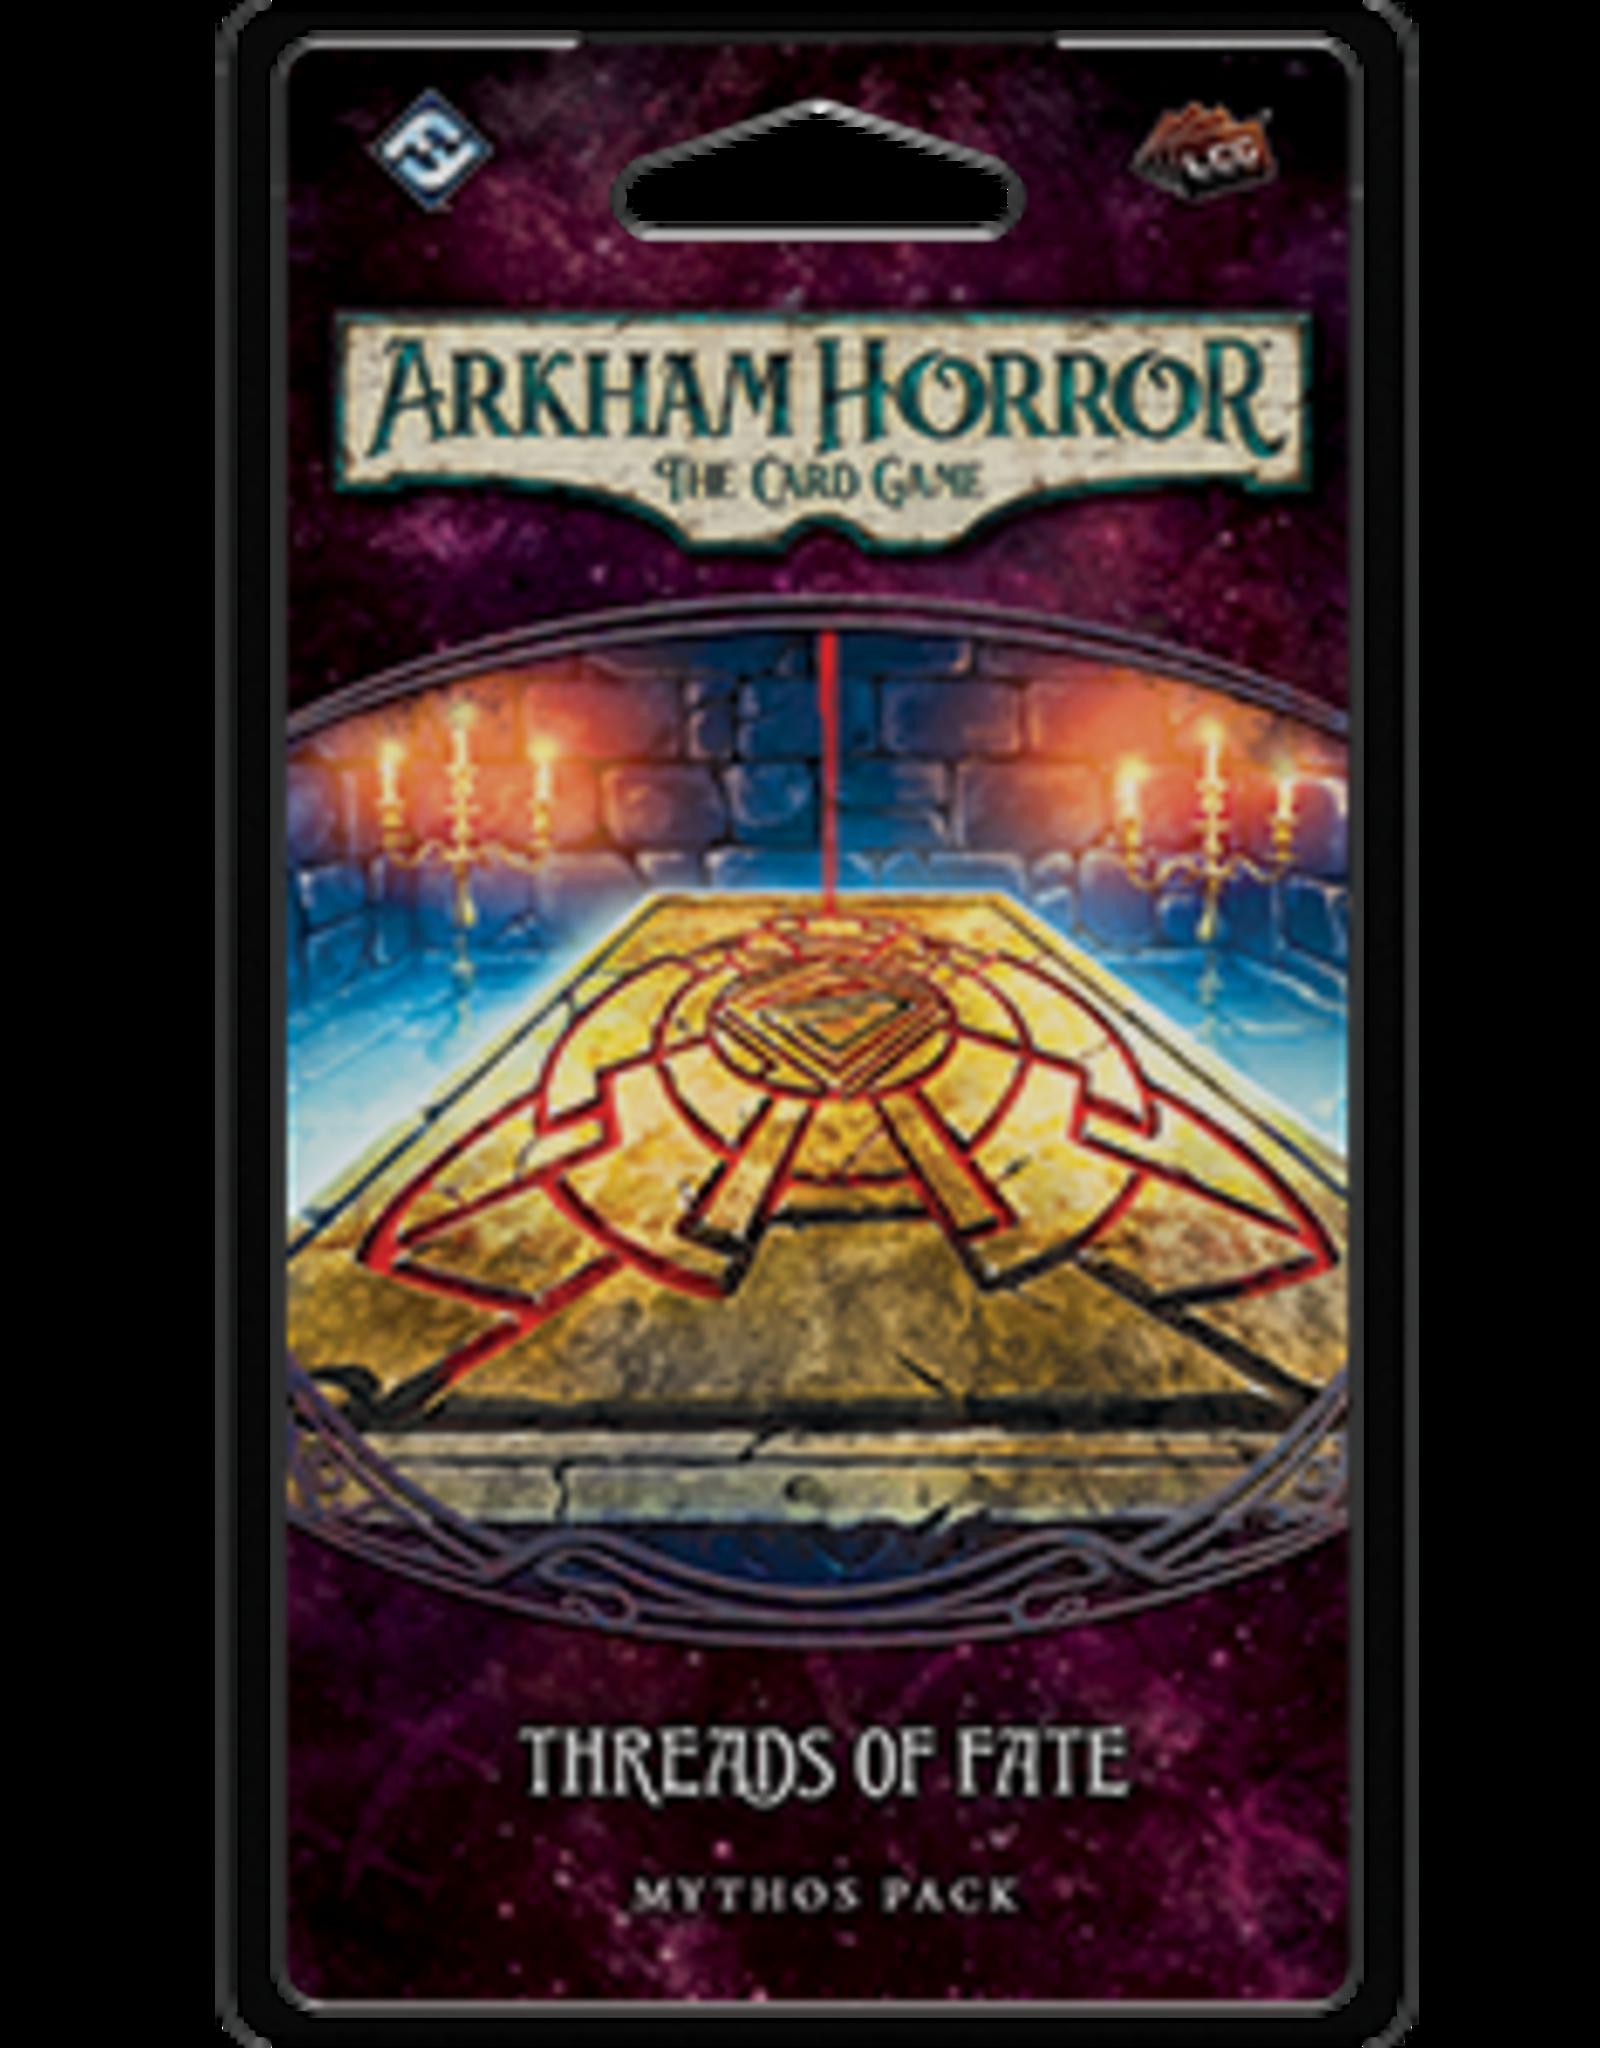 Fantasy Flight Arkham Horror LCG Threads of Fate Mythos Pack